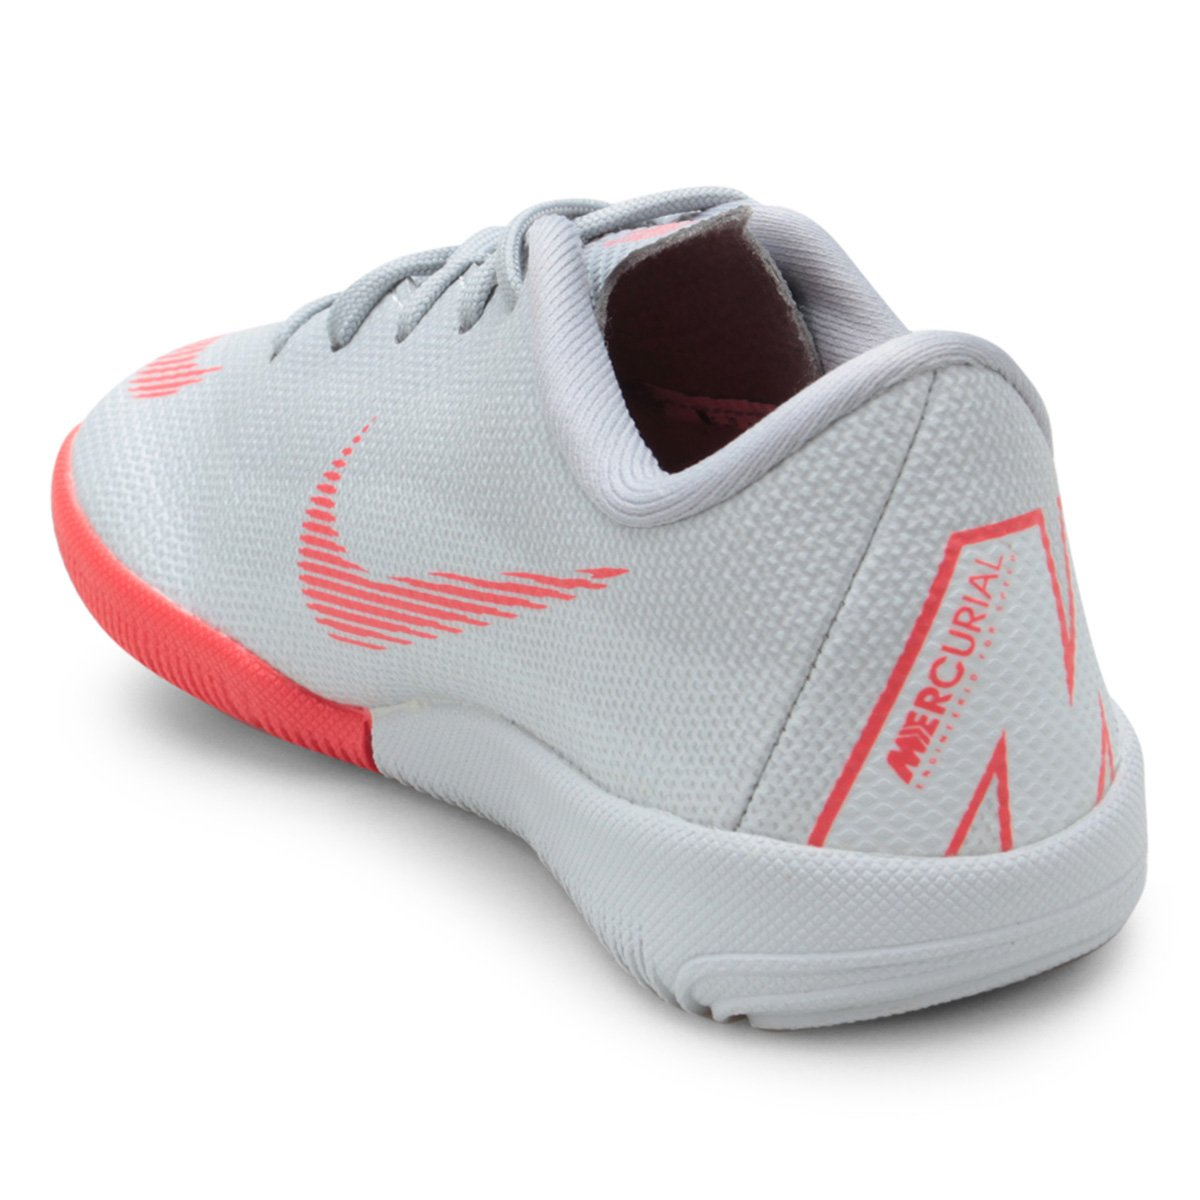 486ba4b0792f0 Chuteira Futsal Infantil Nike Mercurial Vapor 12 Academy | Livelo ...